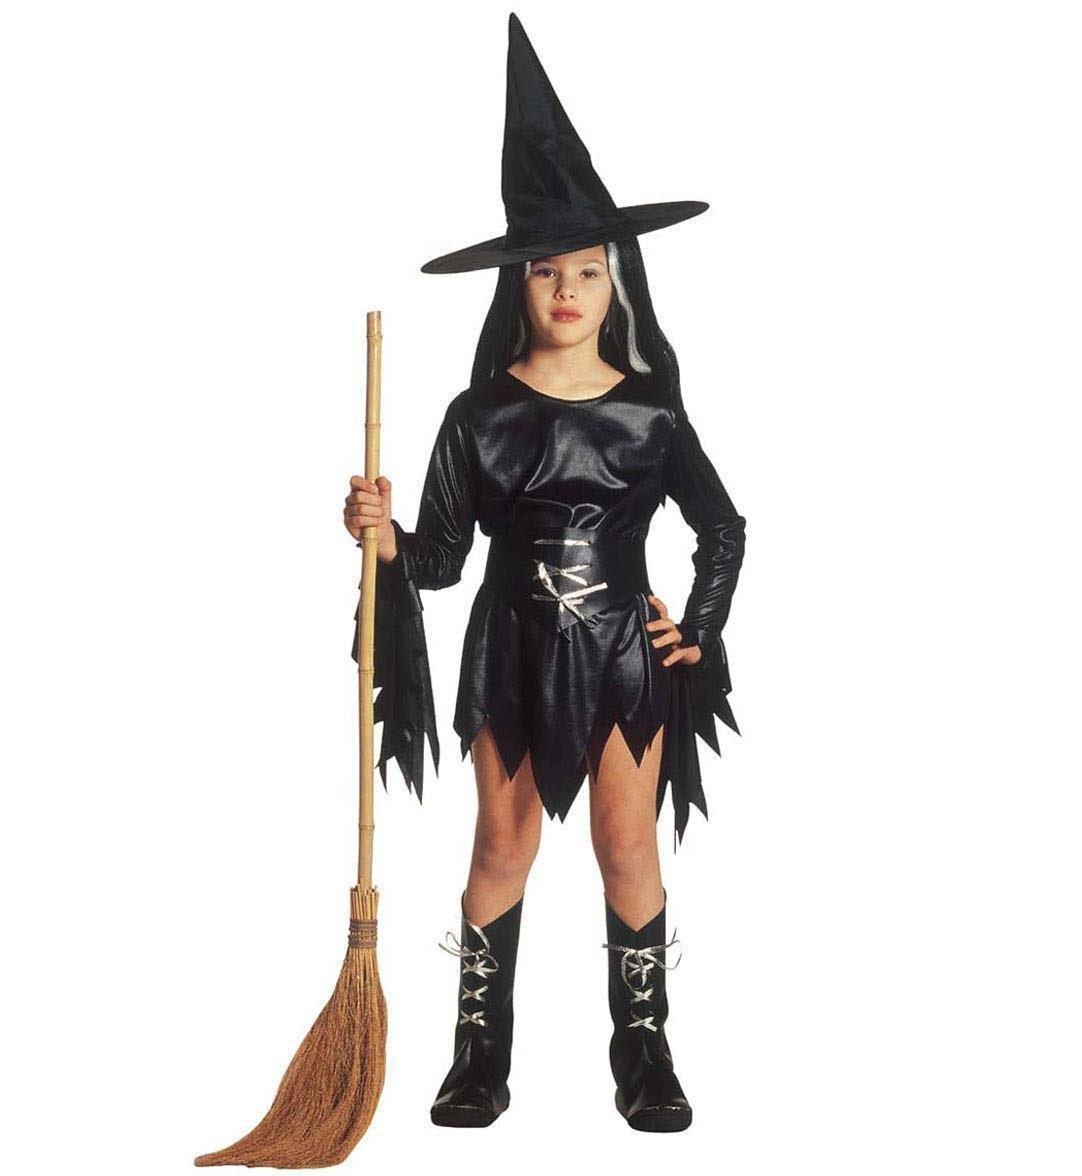 Vestito Da Strega Morgana Halloween Travestimento Bambina PS 25692  Pelusciamo Store Marchirolo 767caac12b01